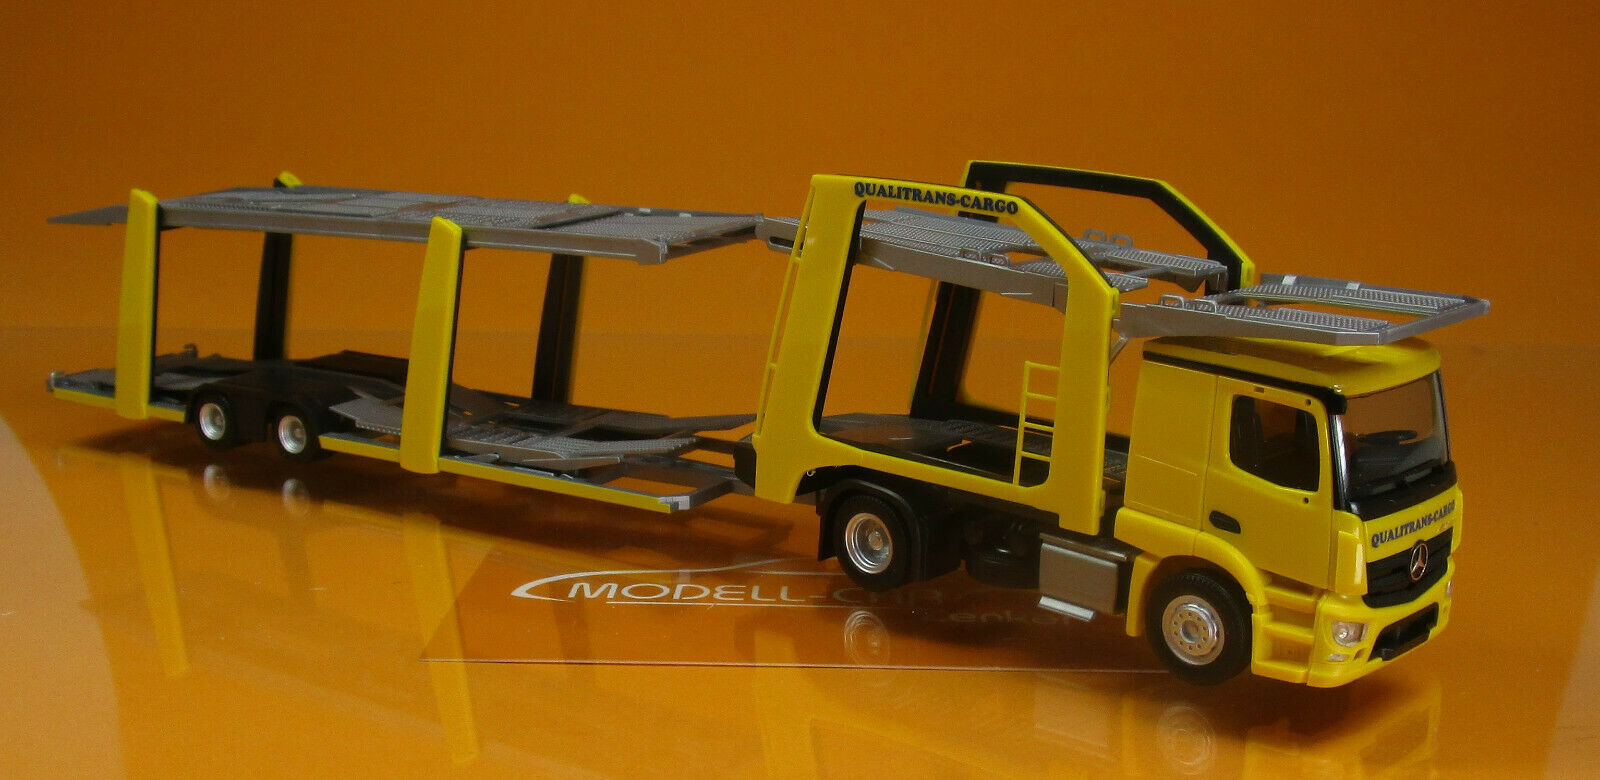 Herpa 309790 MB A Eurol. Autotransporter Qualitrans Cargo Scale Scale Scale 1 87  | Großer Räumungsverkauf  c32a41